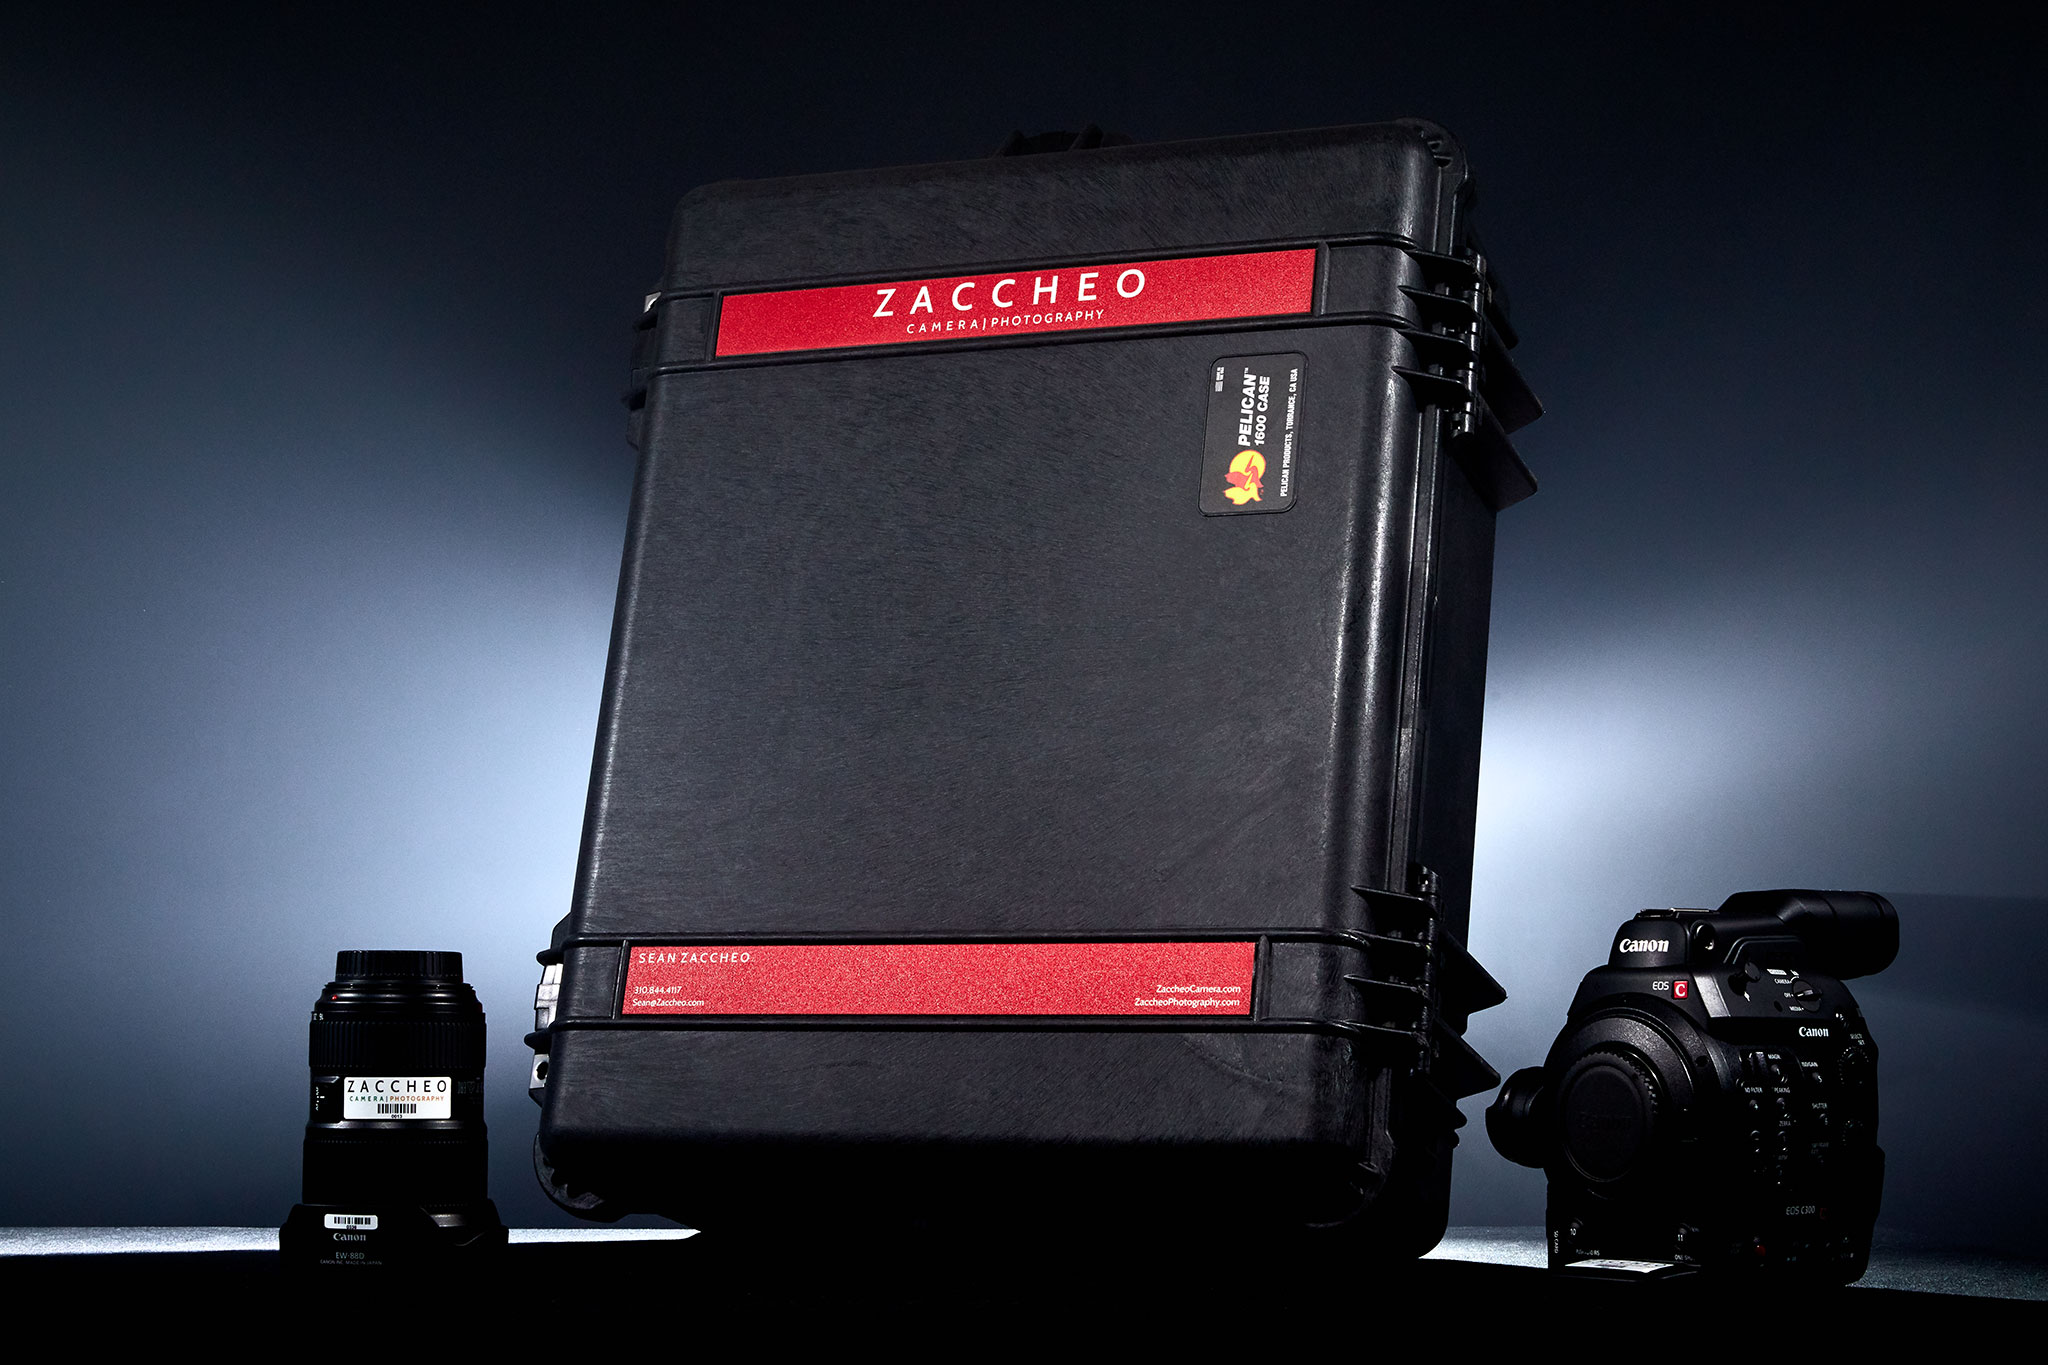 Zaccheo-Products0704.jpg